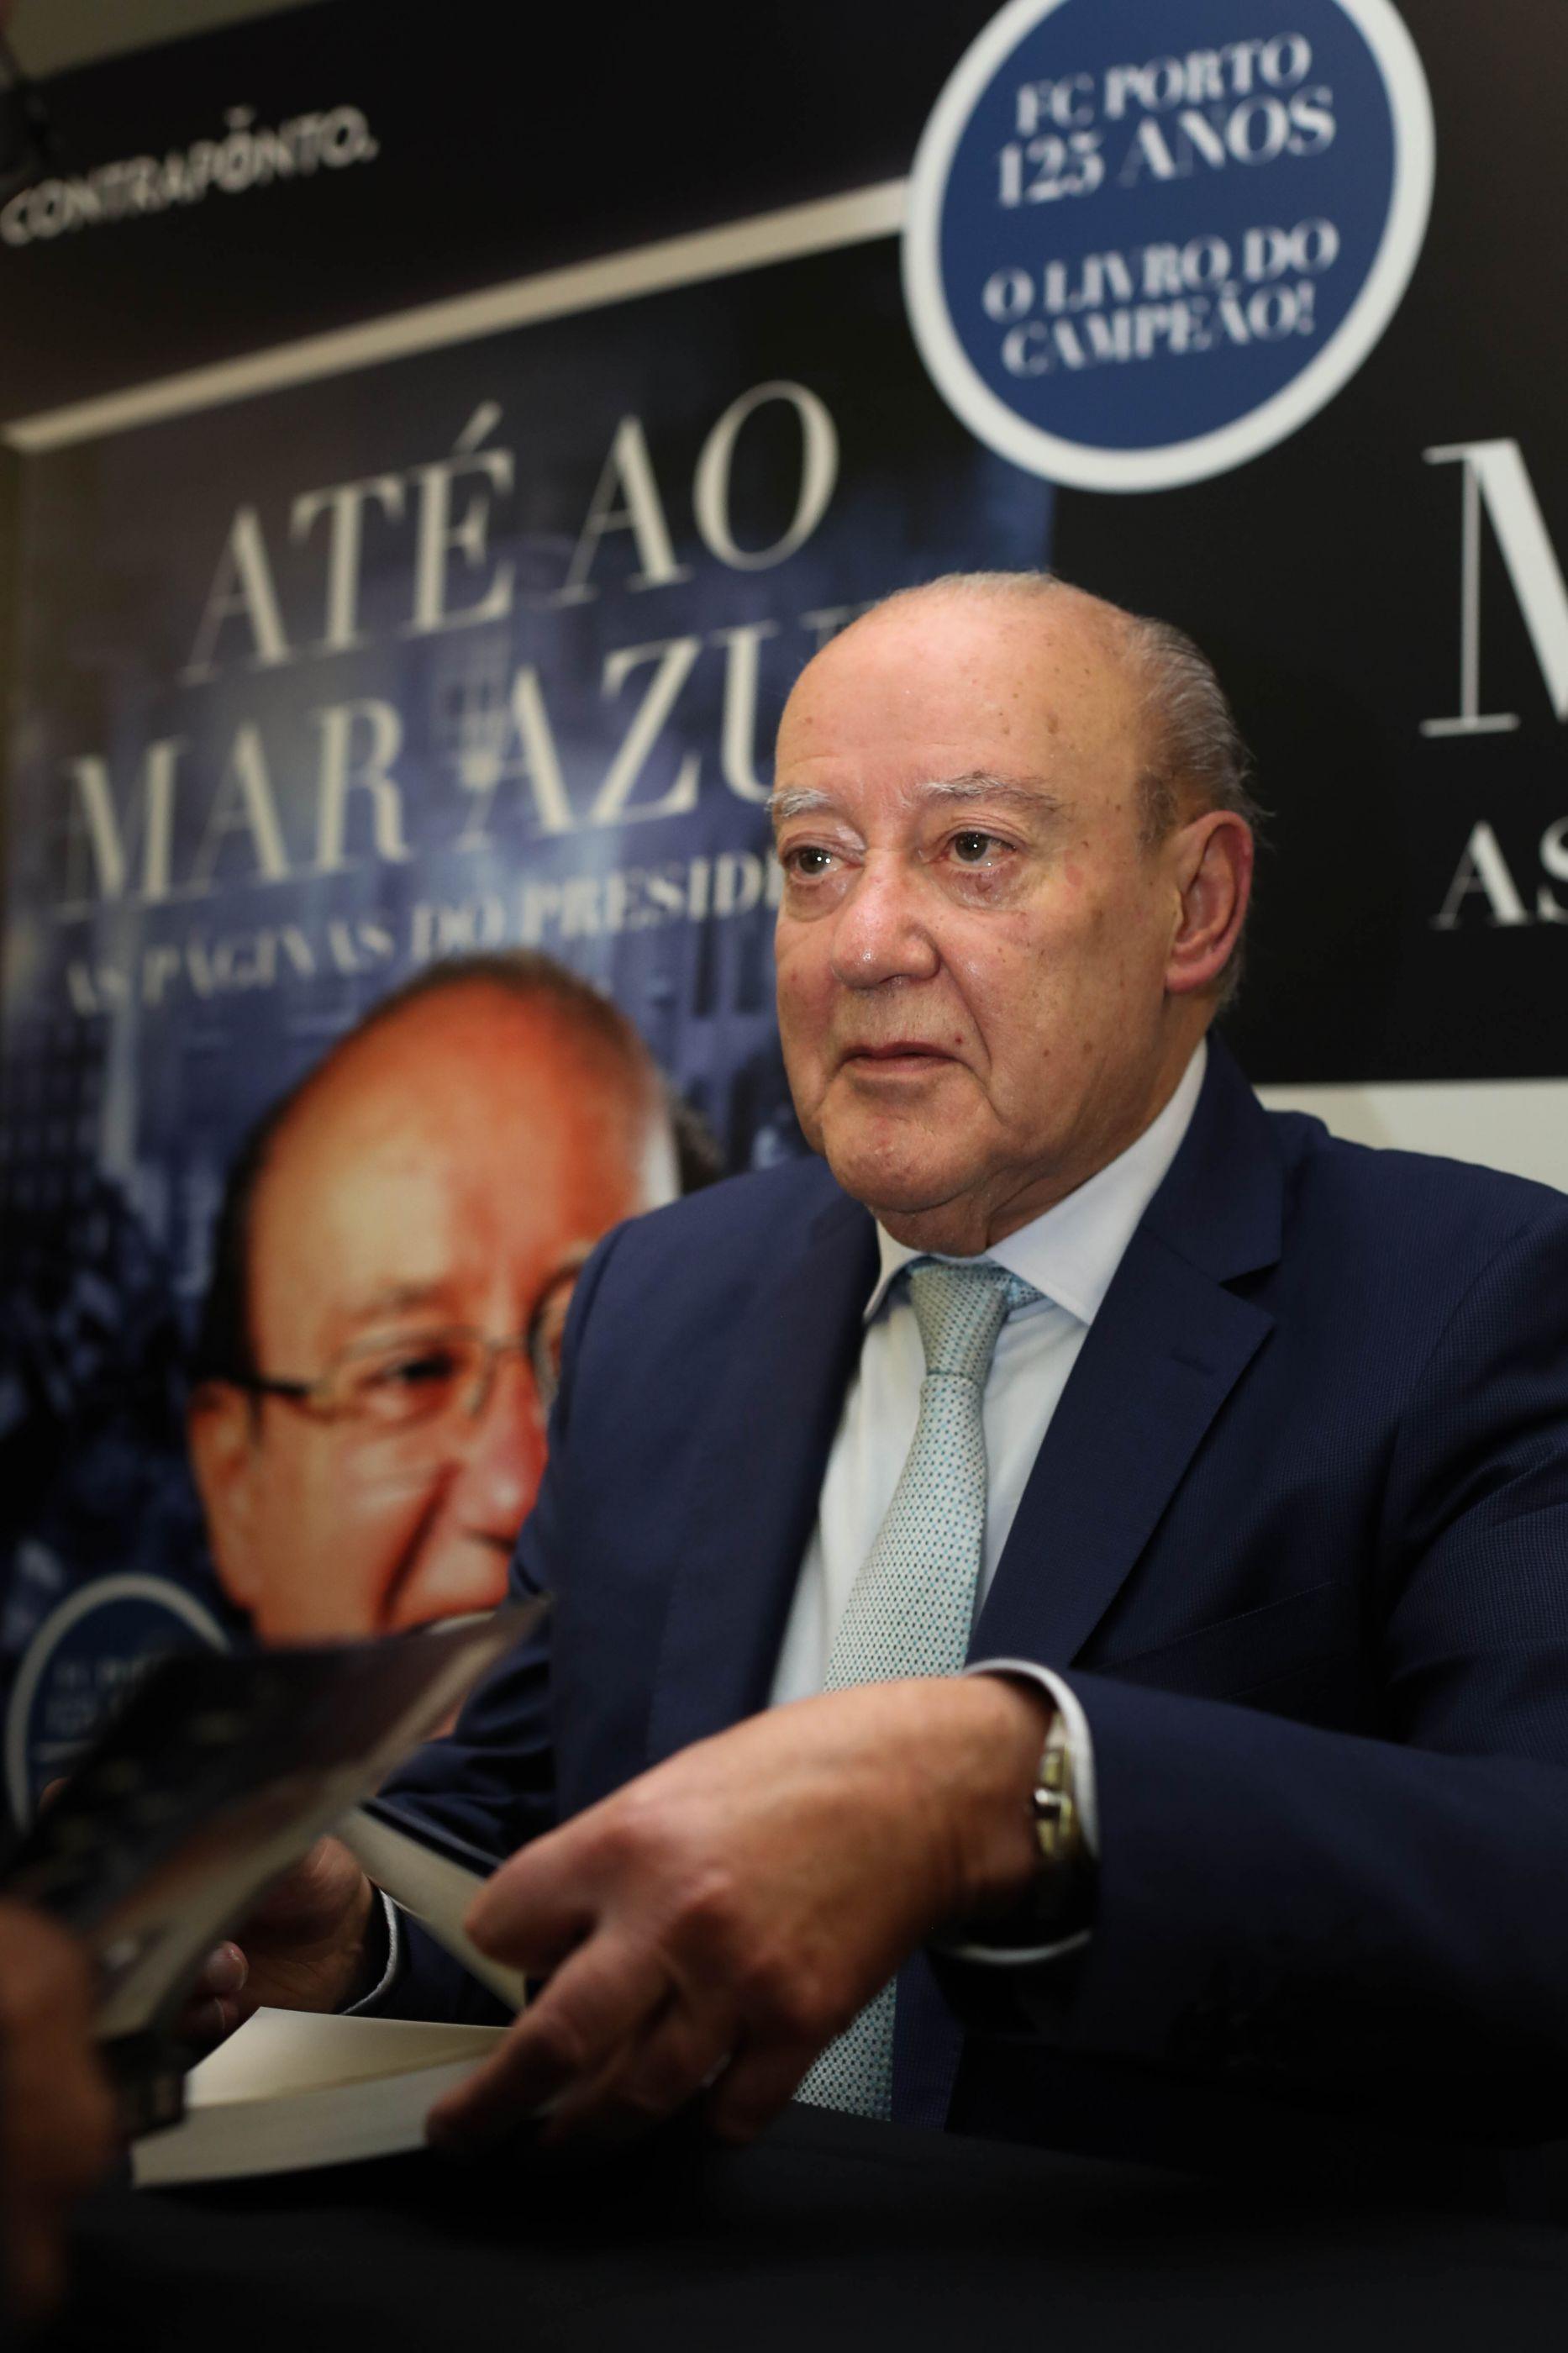 Pinto da Costa arrasa Benfica e deixa ainda uma 'bicada' ao Governo